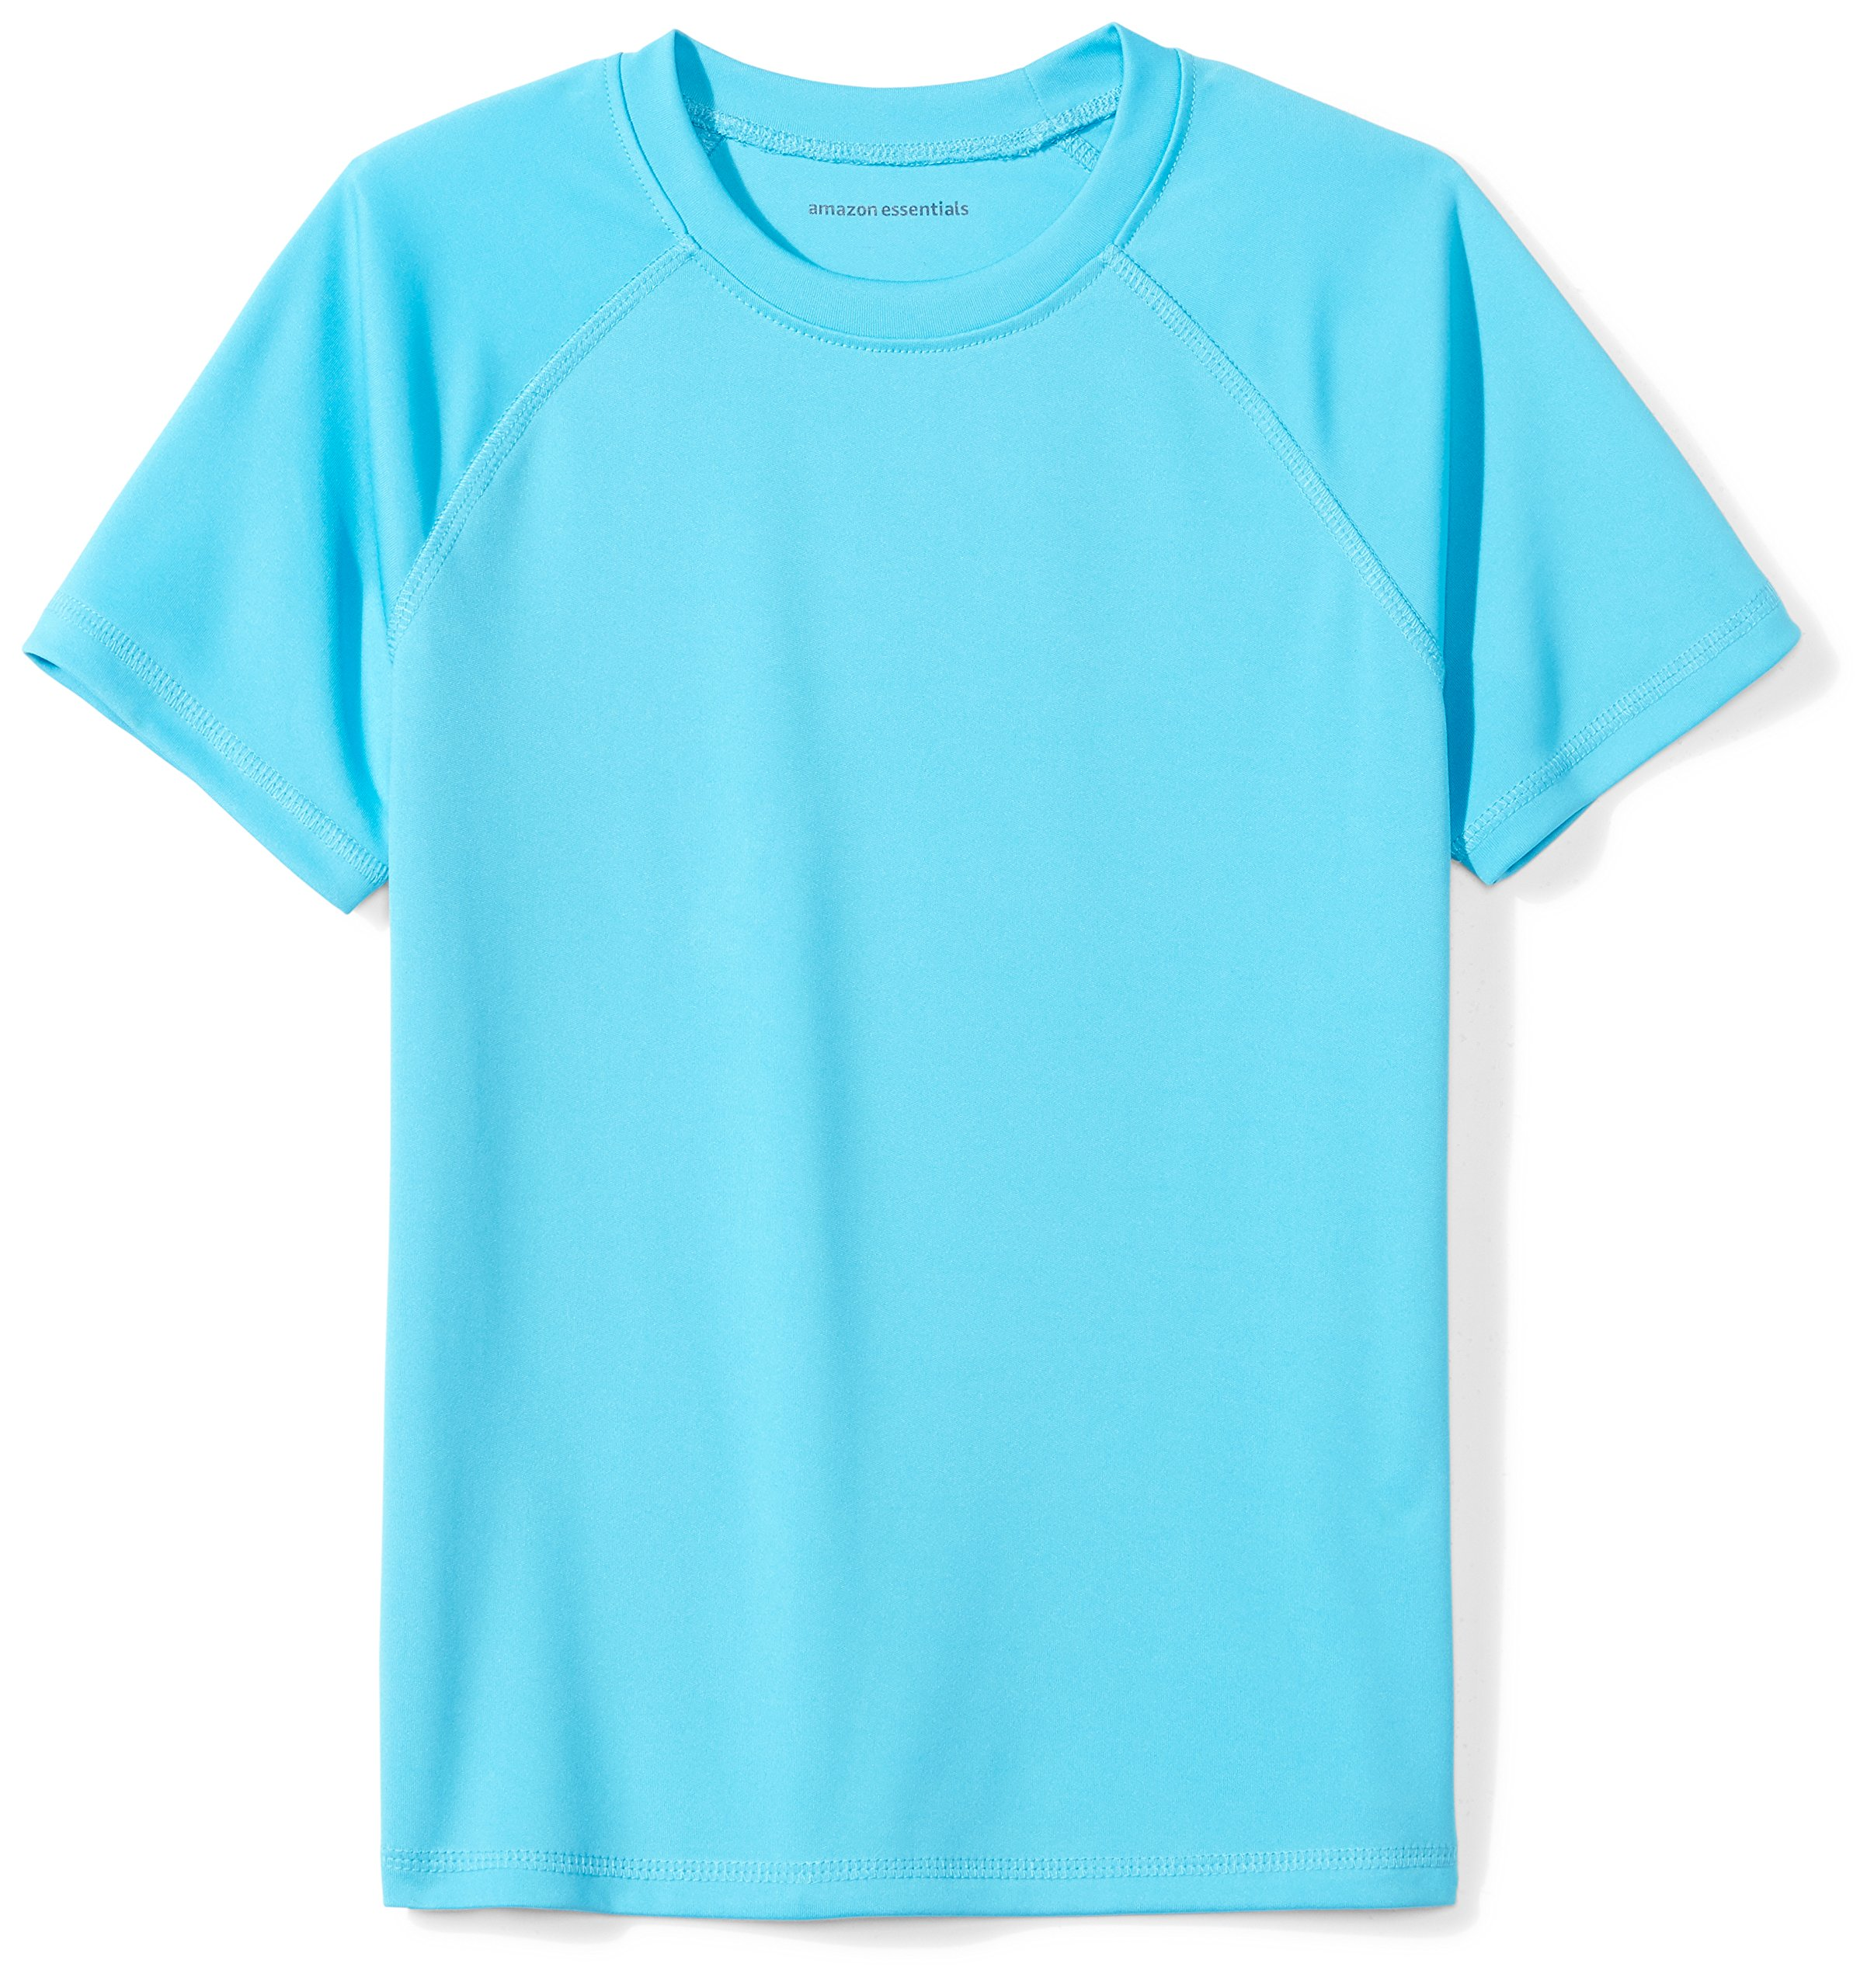 Amazon Essentials Boys' Swim Tee, Aqua, L (10)